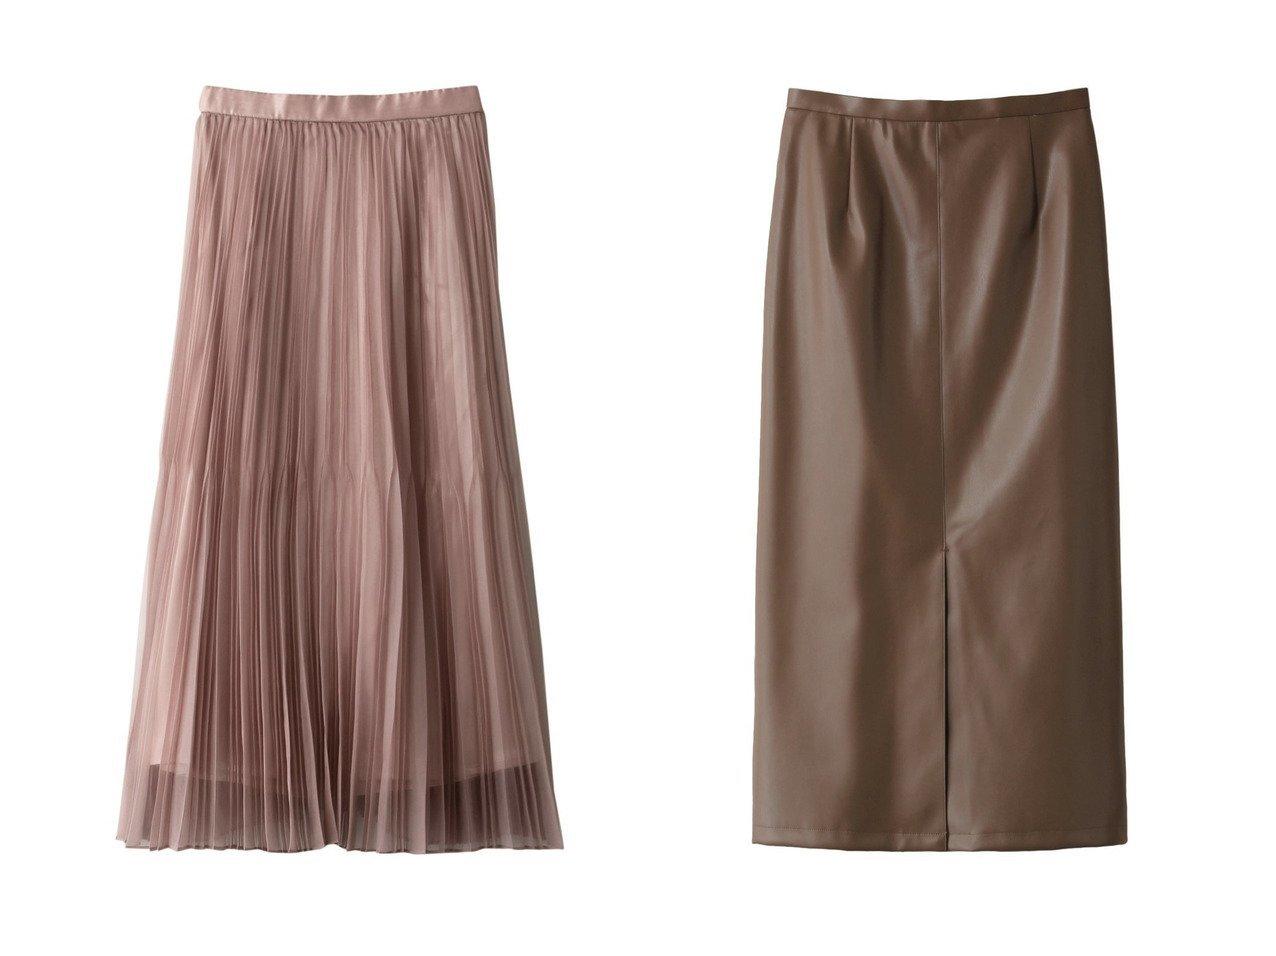 【allureville/アルアバイル】のフェイクレザーフロントベントタイトスカート&【Loulou Willoughby】マットオーガンシアープリーツスカート スカートのおすすめ!人気、レディースファッションの通販 おすすめで人気のファッション通販商品 インテリア・家具・キッズファッション・メンズファッション・レディースファッション・服の通販 founy(ファニー) https://founy.com/ ファッション Fashion レディース WOMEN スカート Skirt プリーツスカート Pleated Skirts ロングスカート Long Skirt エアリー オーガンジー シアー パーティ ロング |ID:crp329100000001179